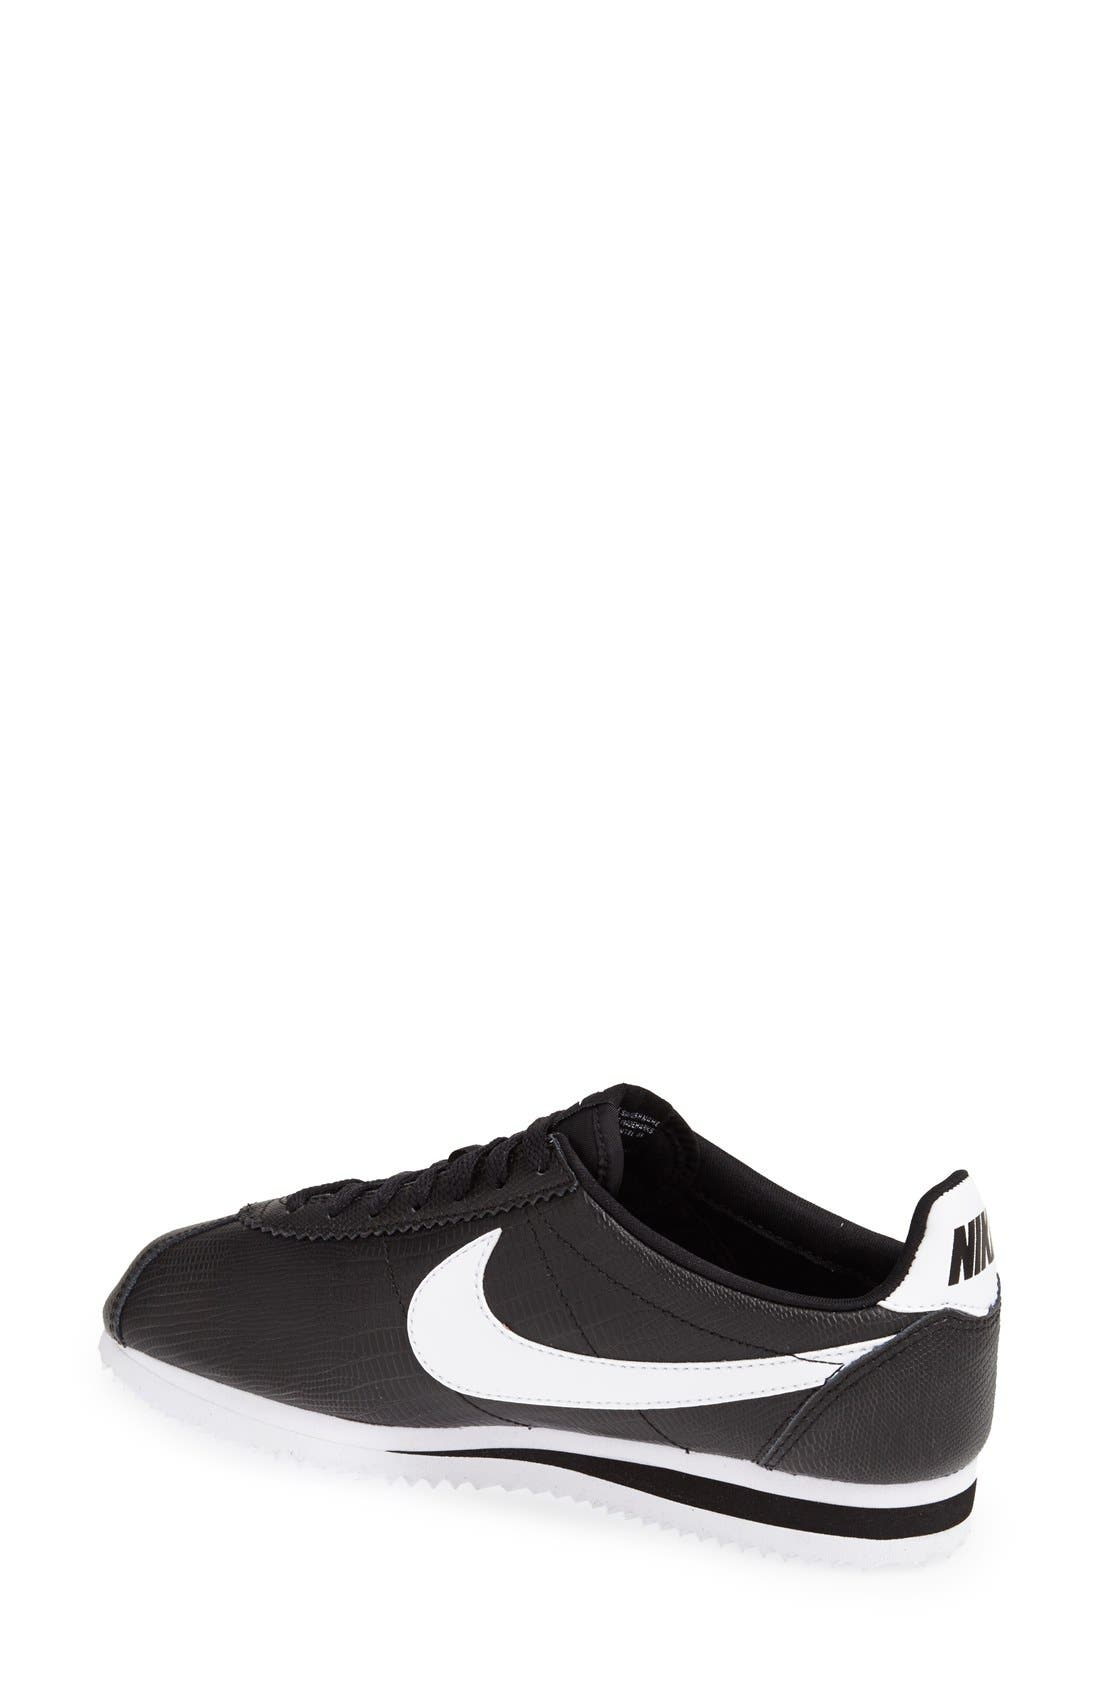 Alternate Image 2  - Nike 'Classic Cortez' Leather Sneaker (Women)